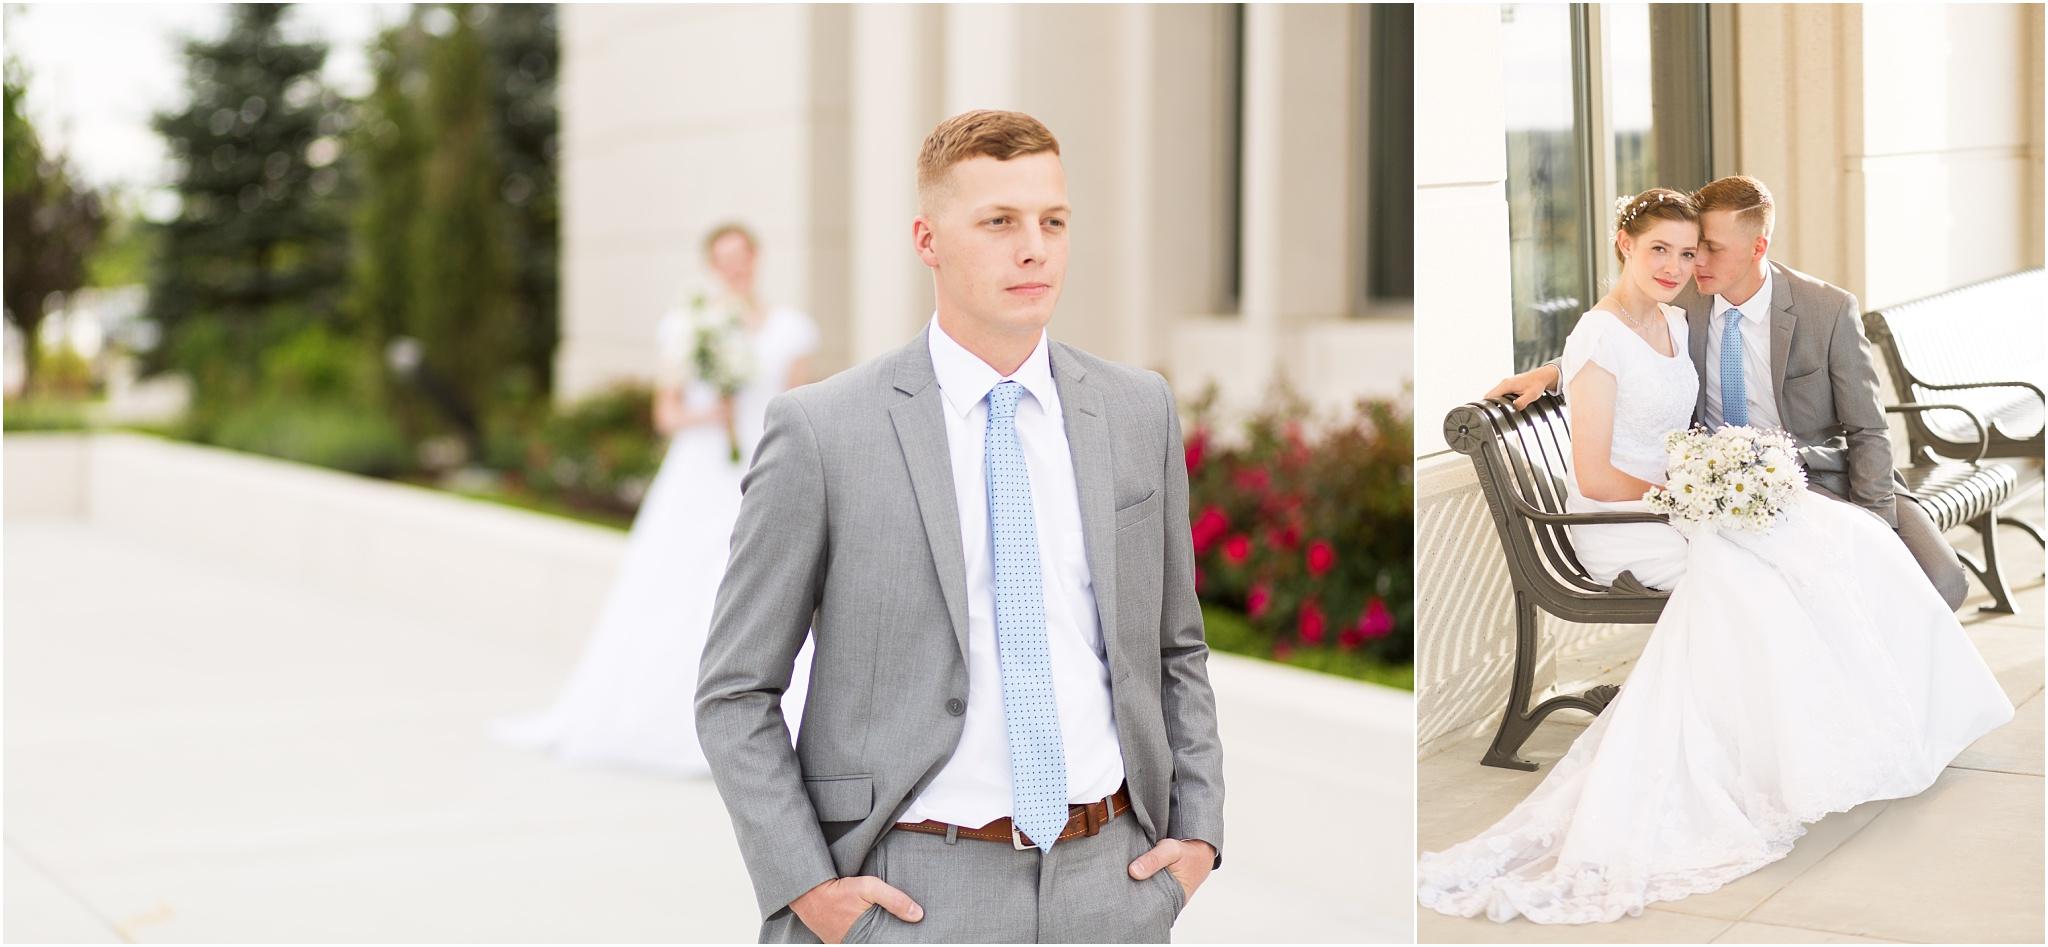 Wedding Photography_Meridian Idaho Temple_Boise Idaho_Leah Southwick Photography_0043.jpg